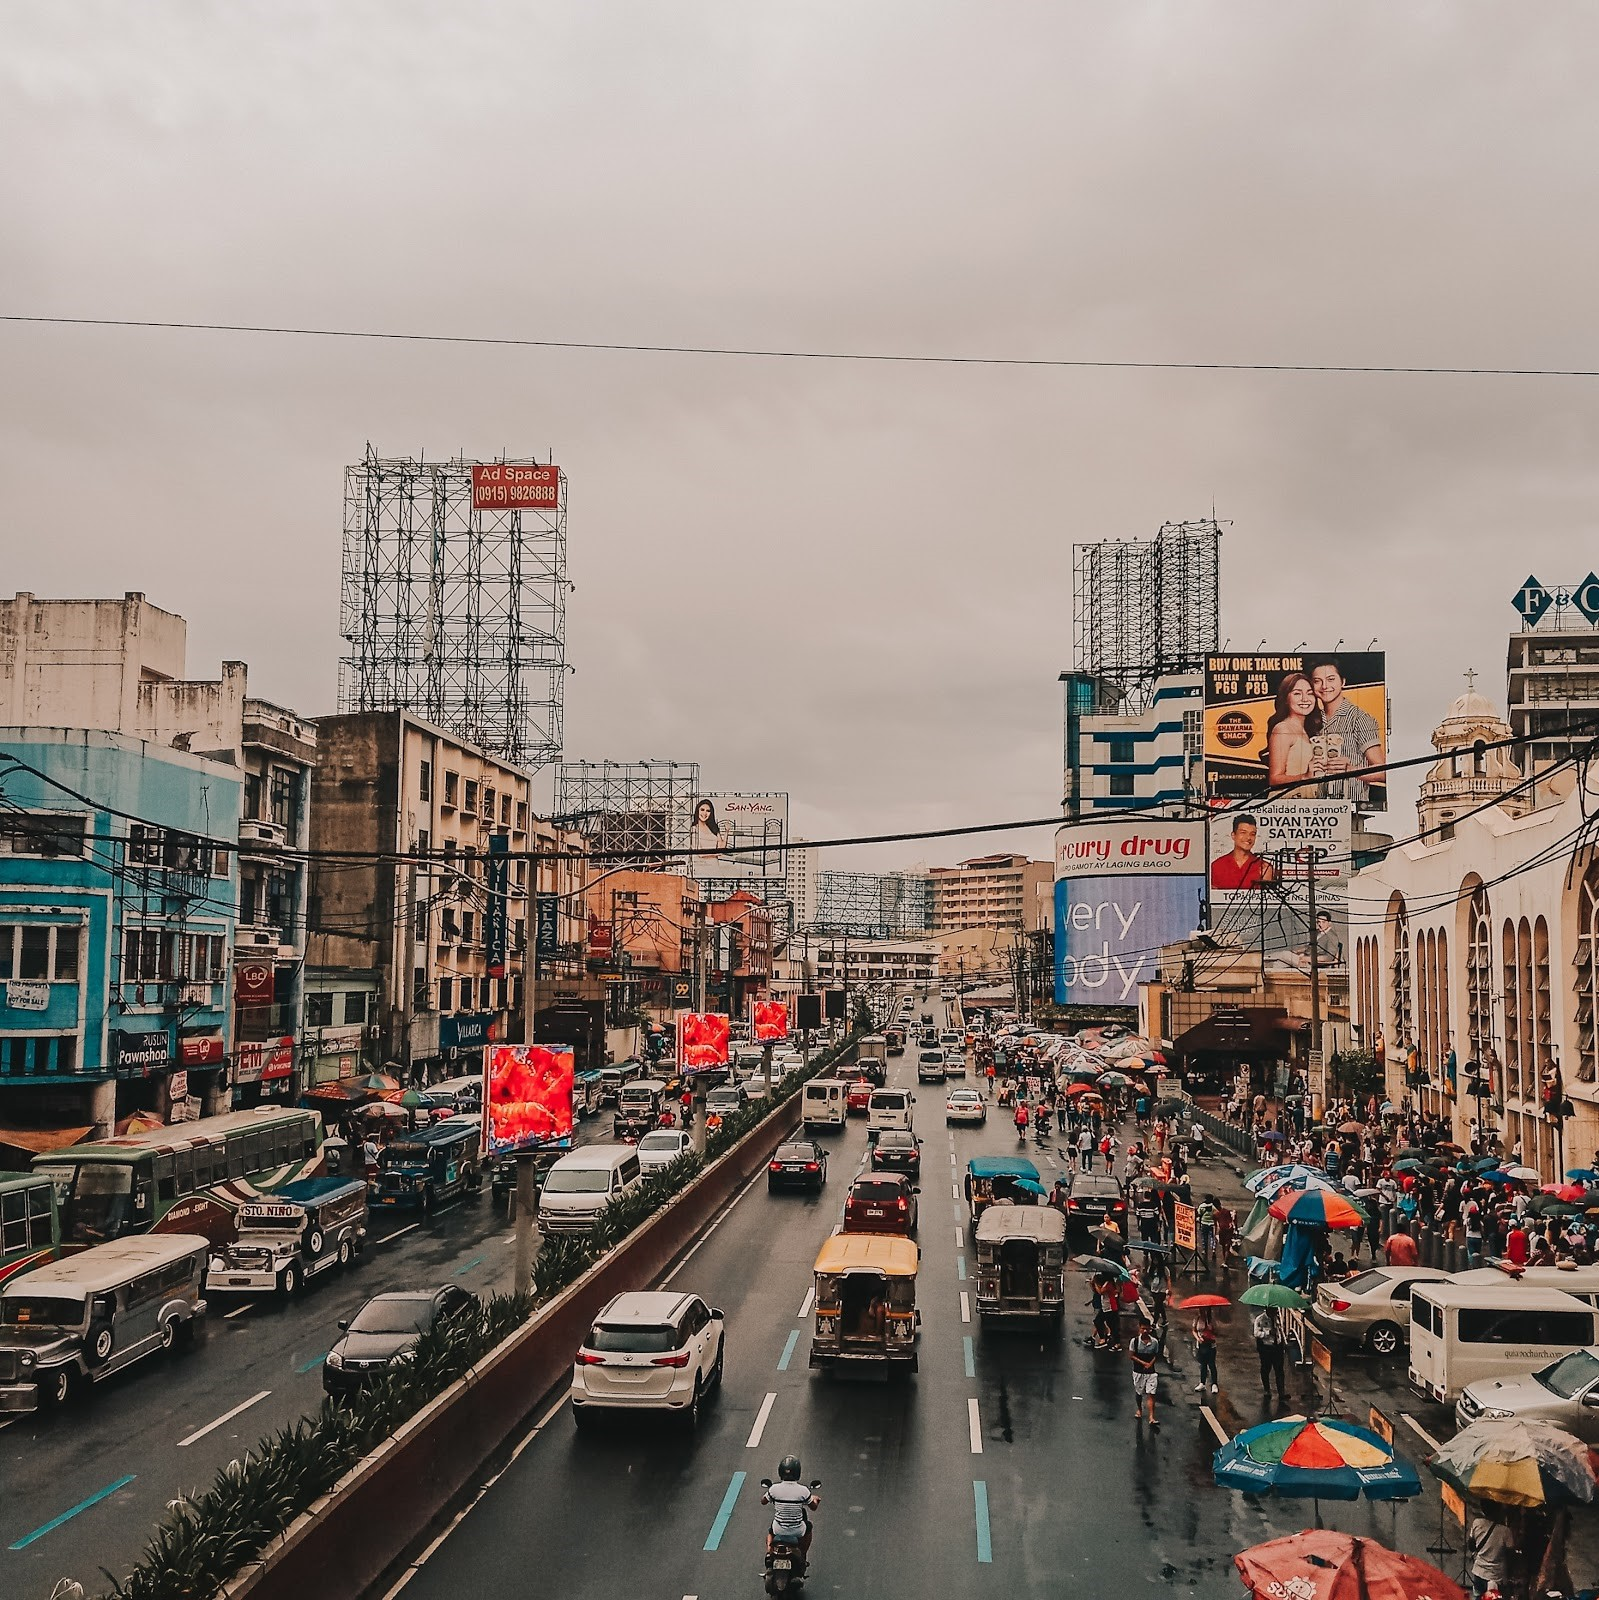 Photo courtesy of Marfil Graganza Aquino via Pexels